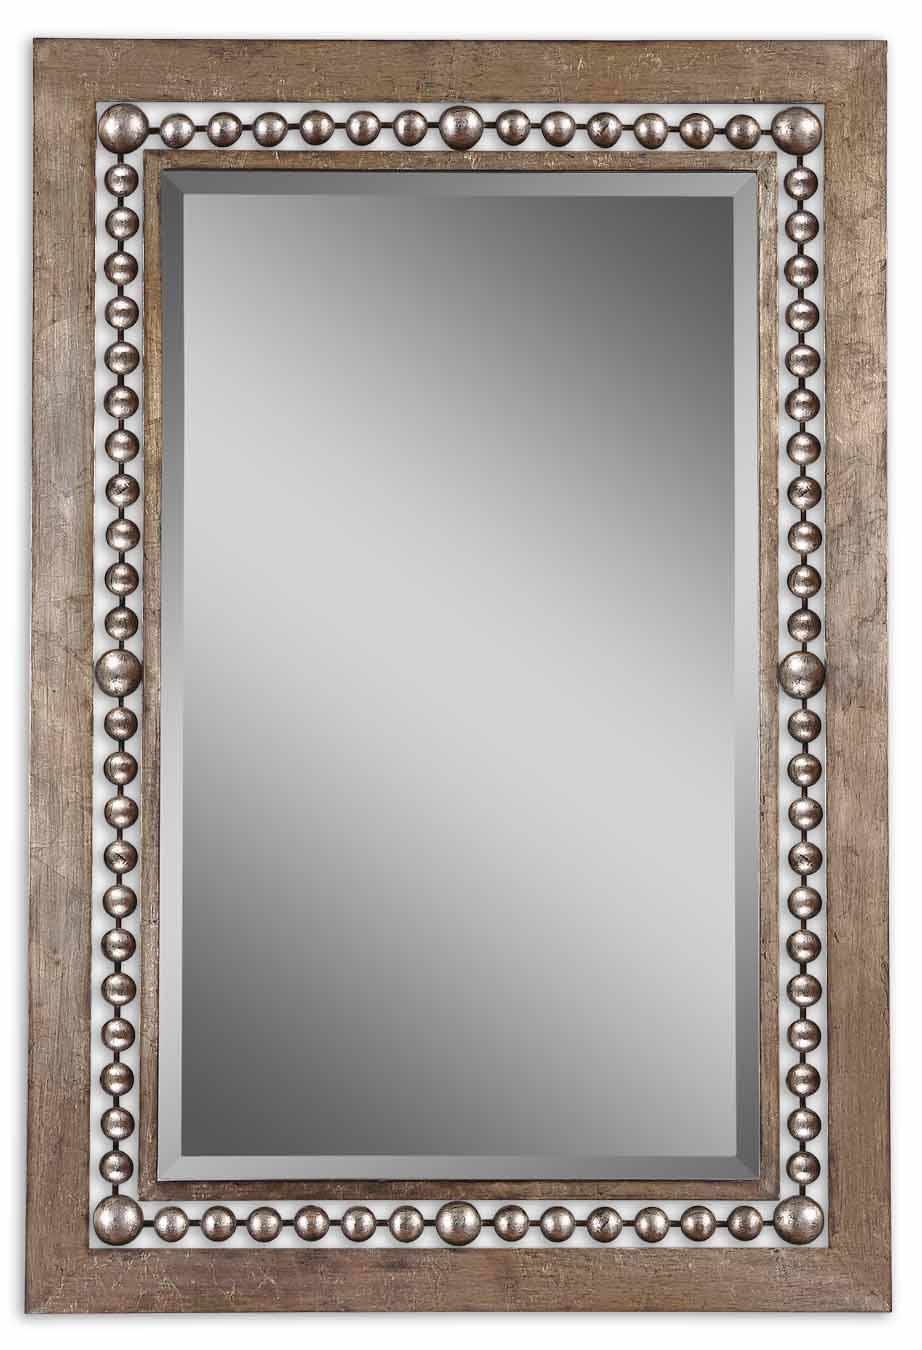 Uttermost Mirrors Fidda Mirror - Item Number: 13724